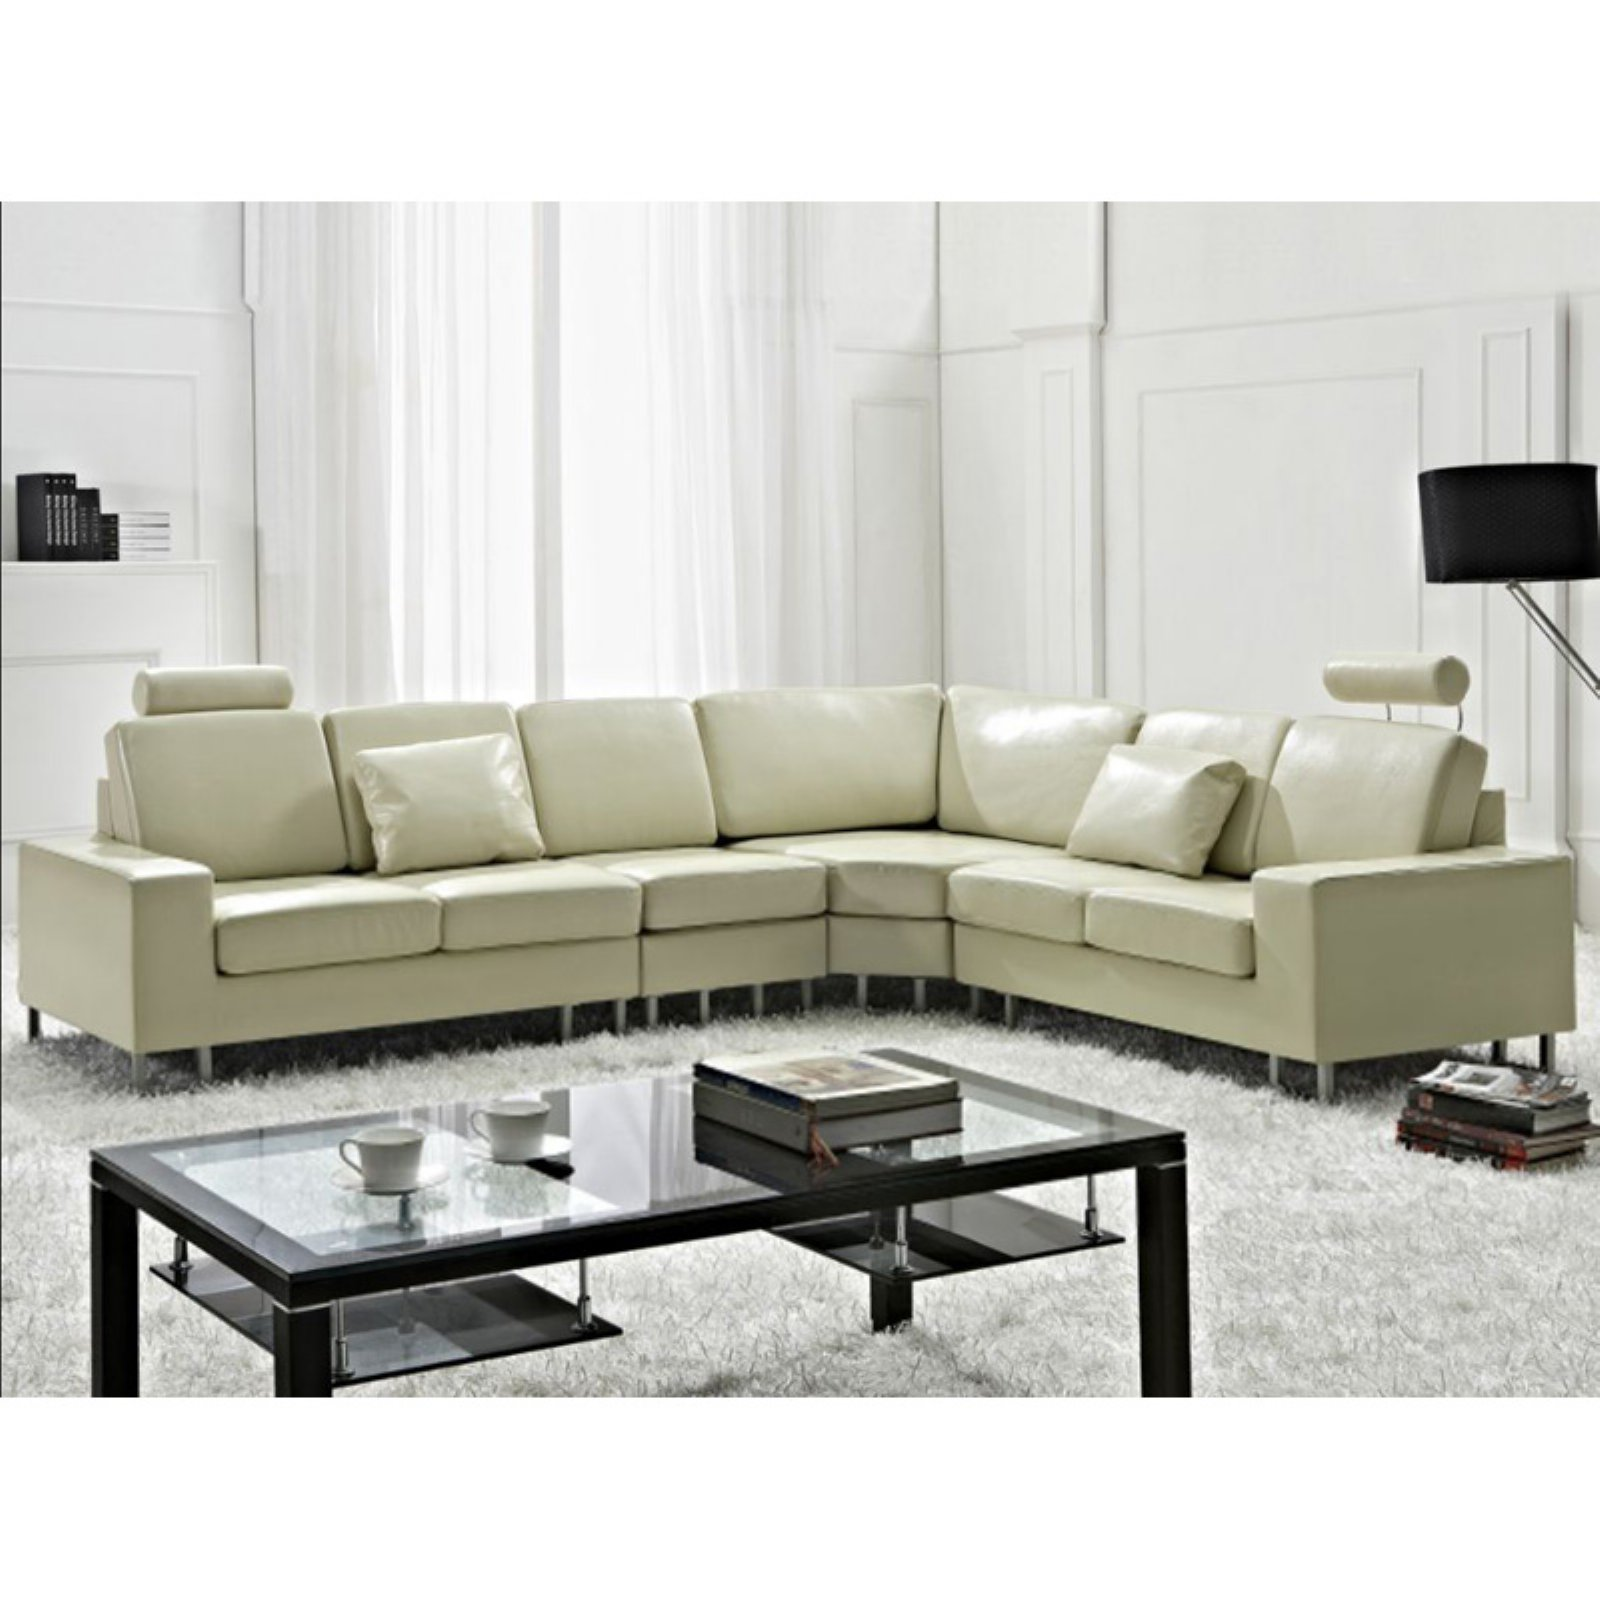 Velago Stockholm Fabric Sectional Sofa